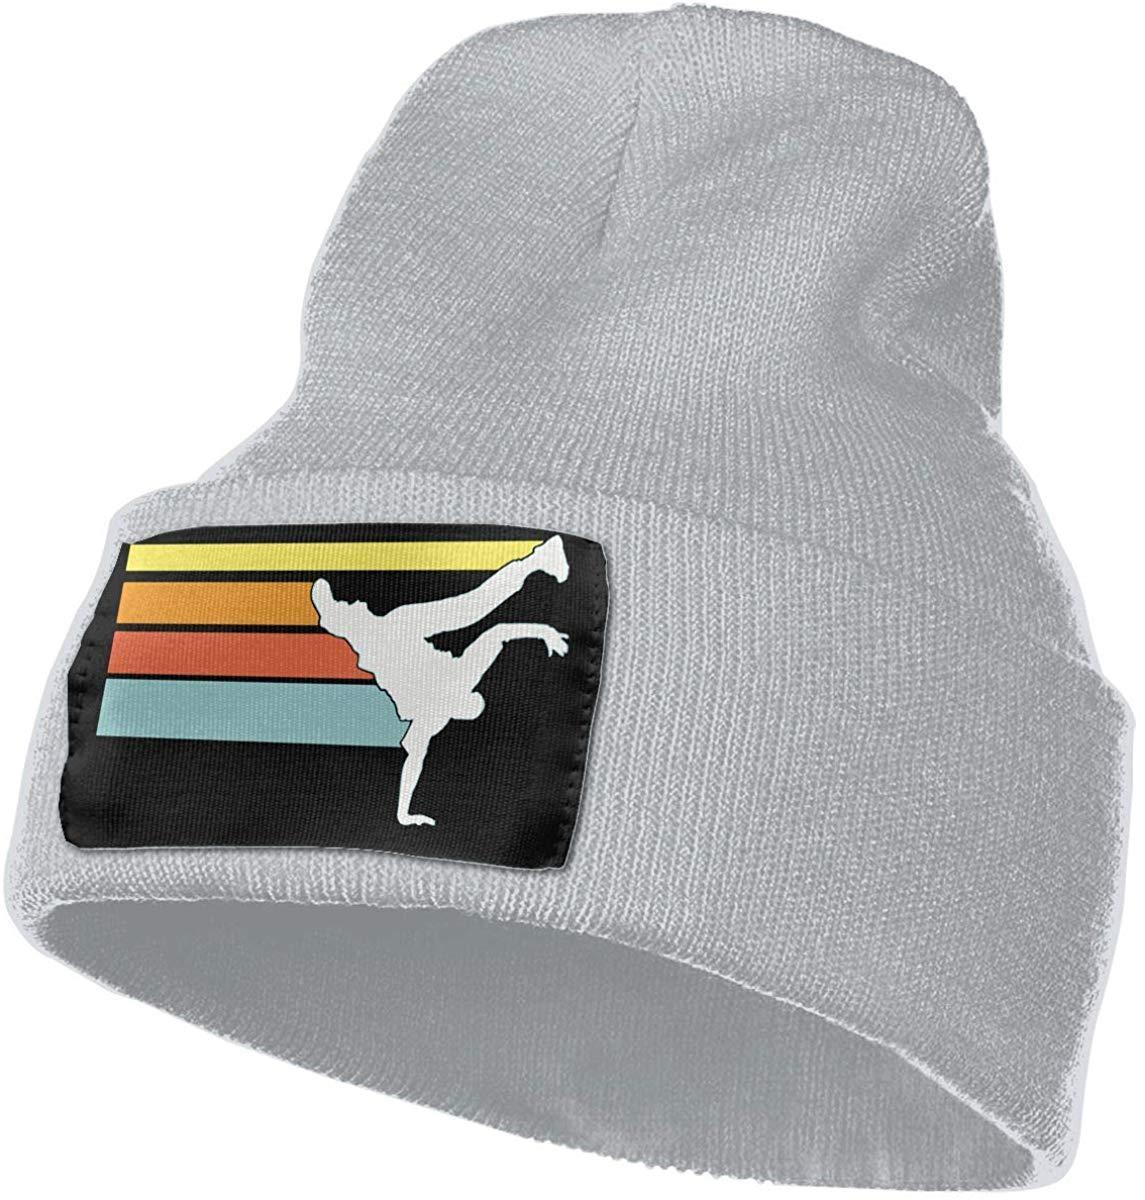 tyutrir Gorra de Lana Diaria para Hombres y Mujeres 100/% /ácido acr/ílico Gorra Vintage de Hip Hop Breakdance Stocking 8114